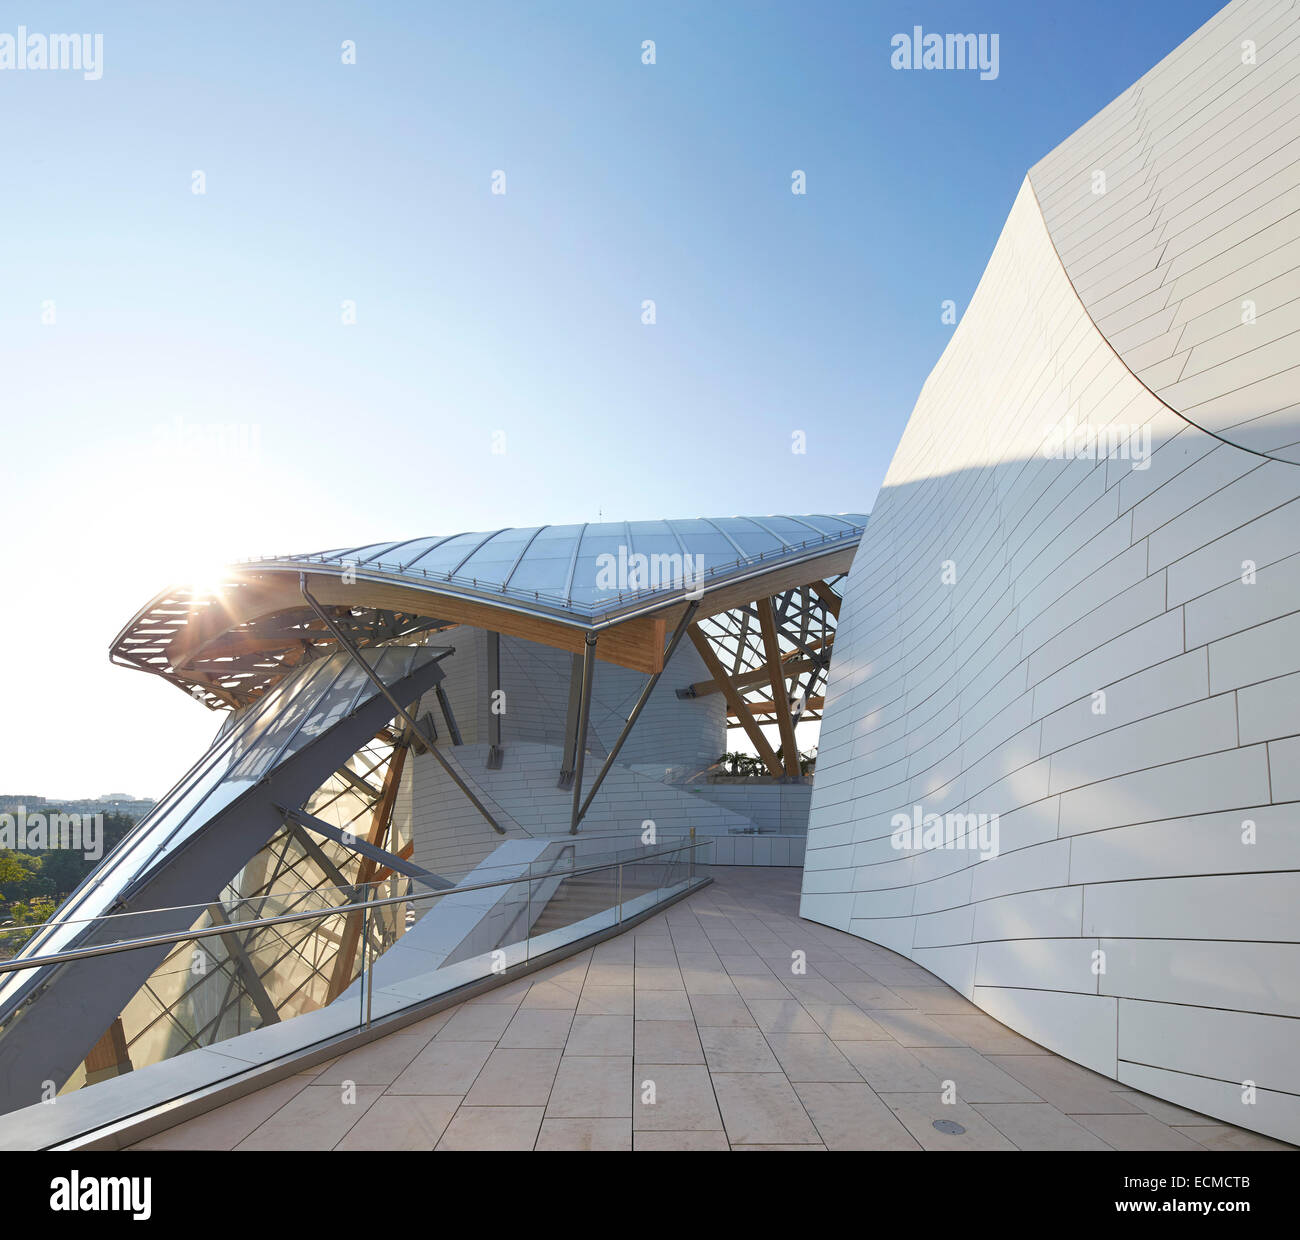 Fondation Louis Vuitton, Paris, France. Architect: Gehry Partners LLP, 2014. Upper terrace walkway with view to Bois de Boulogne Stock Photo